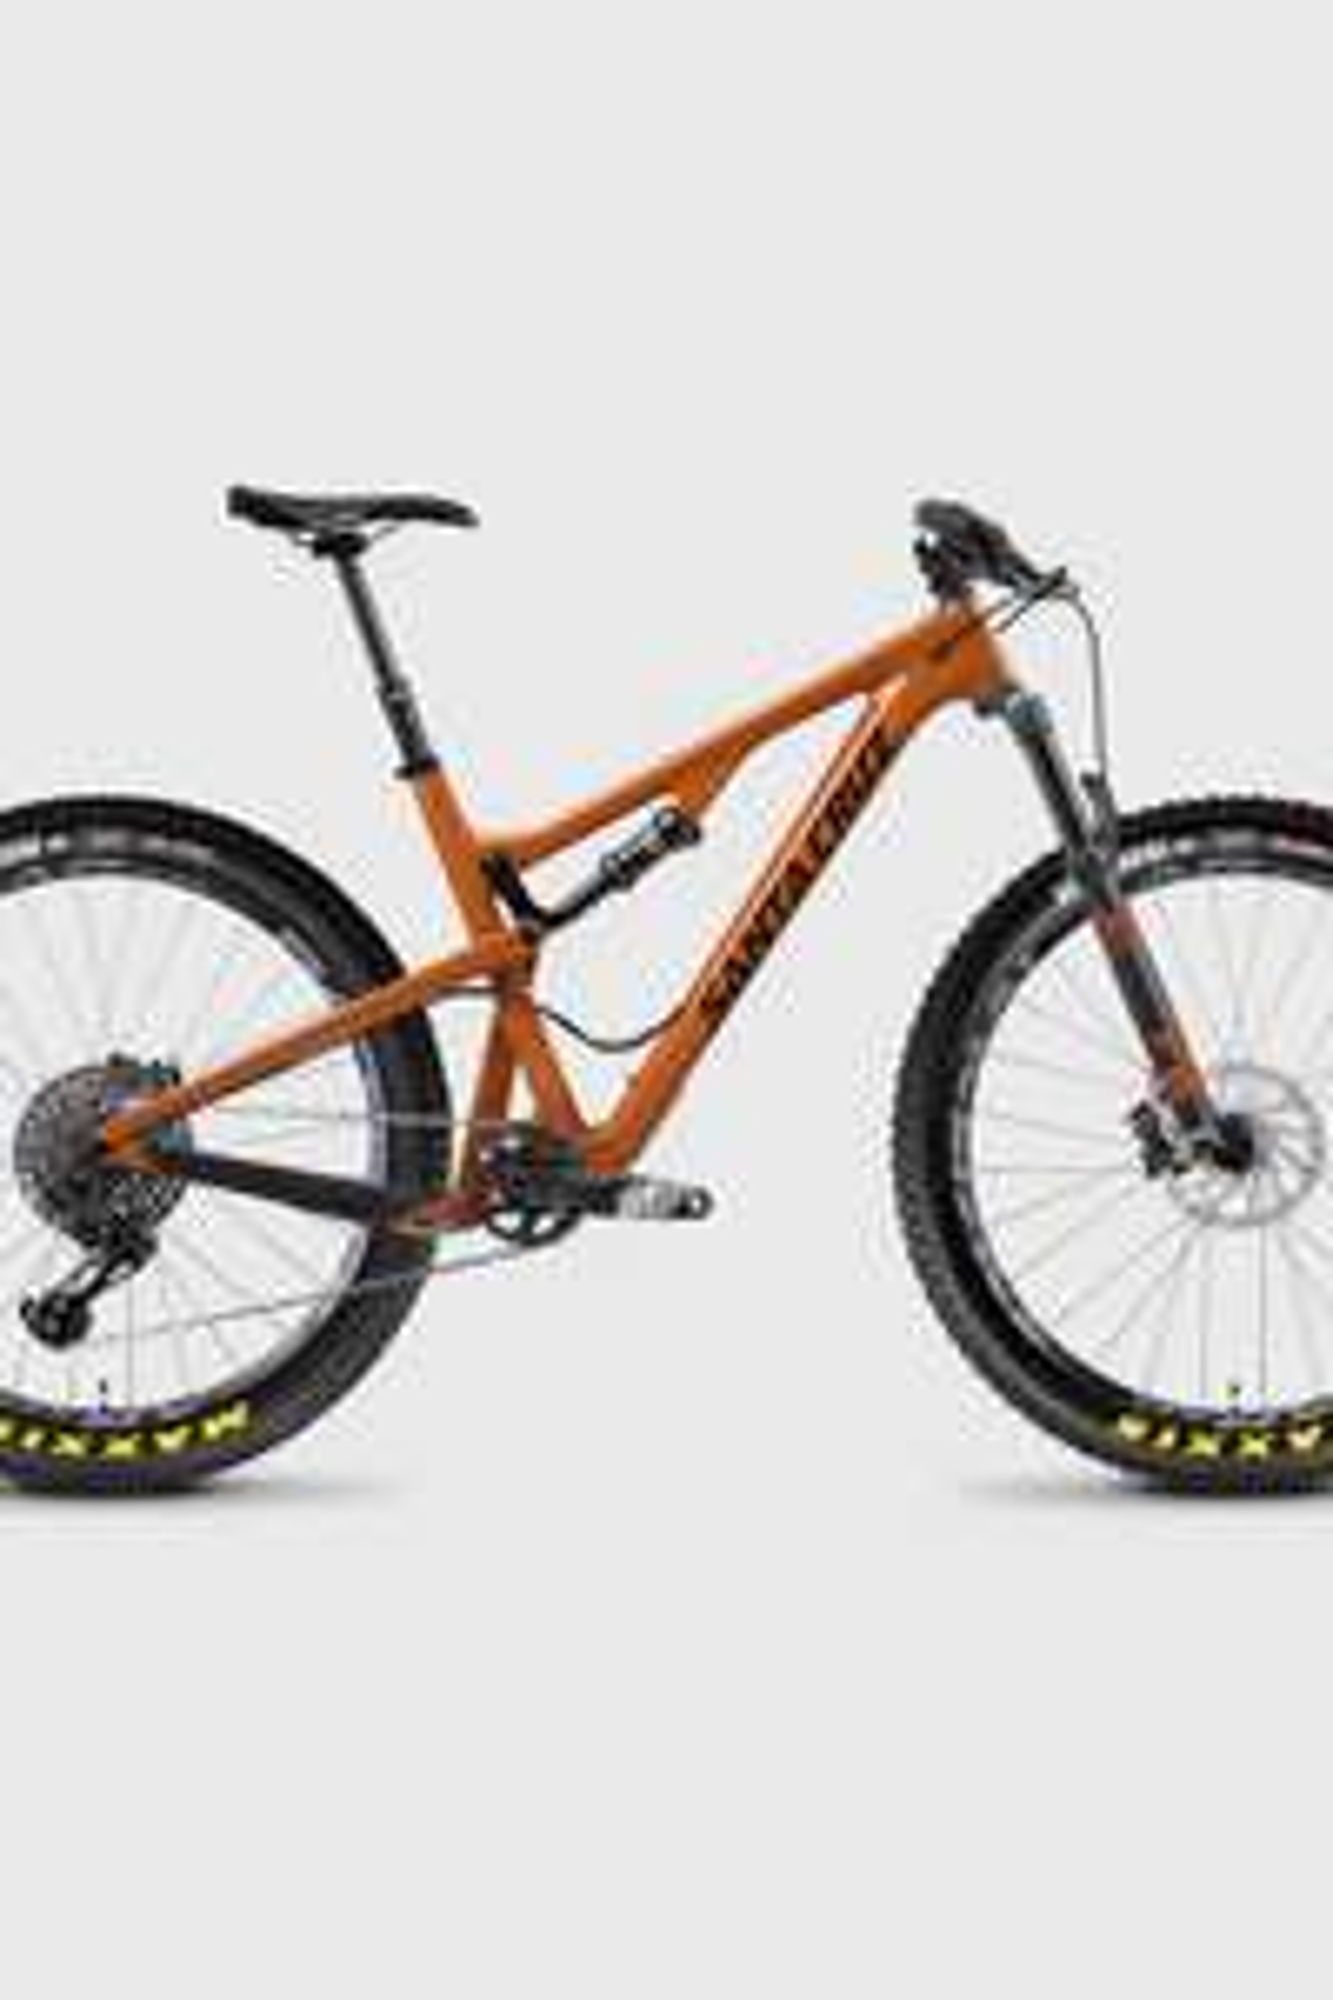 VTT Santa Cruz Tallboy 3 (Eagle) Carbone C S Kit 27-5+ 2018 (Rust et Noir)